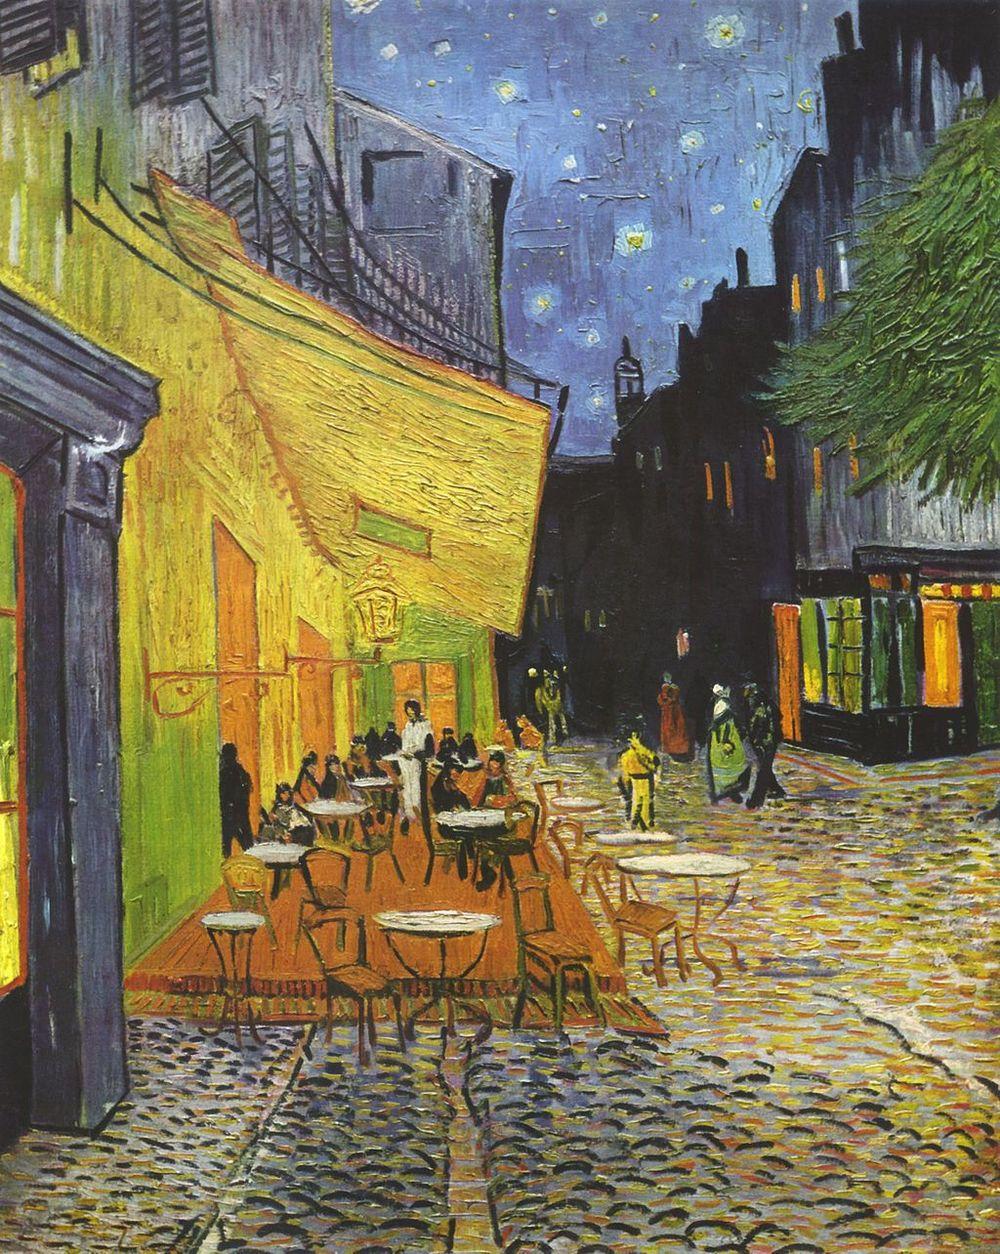 Vincent van Gogh,  The Café Terrace on the Place du Forum, Arles, at Night , 1888, Kröller-Müller Museum, The Netherlands.